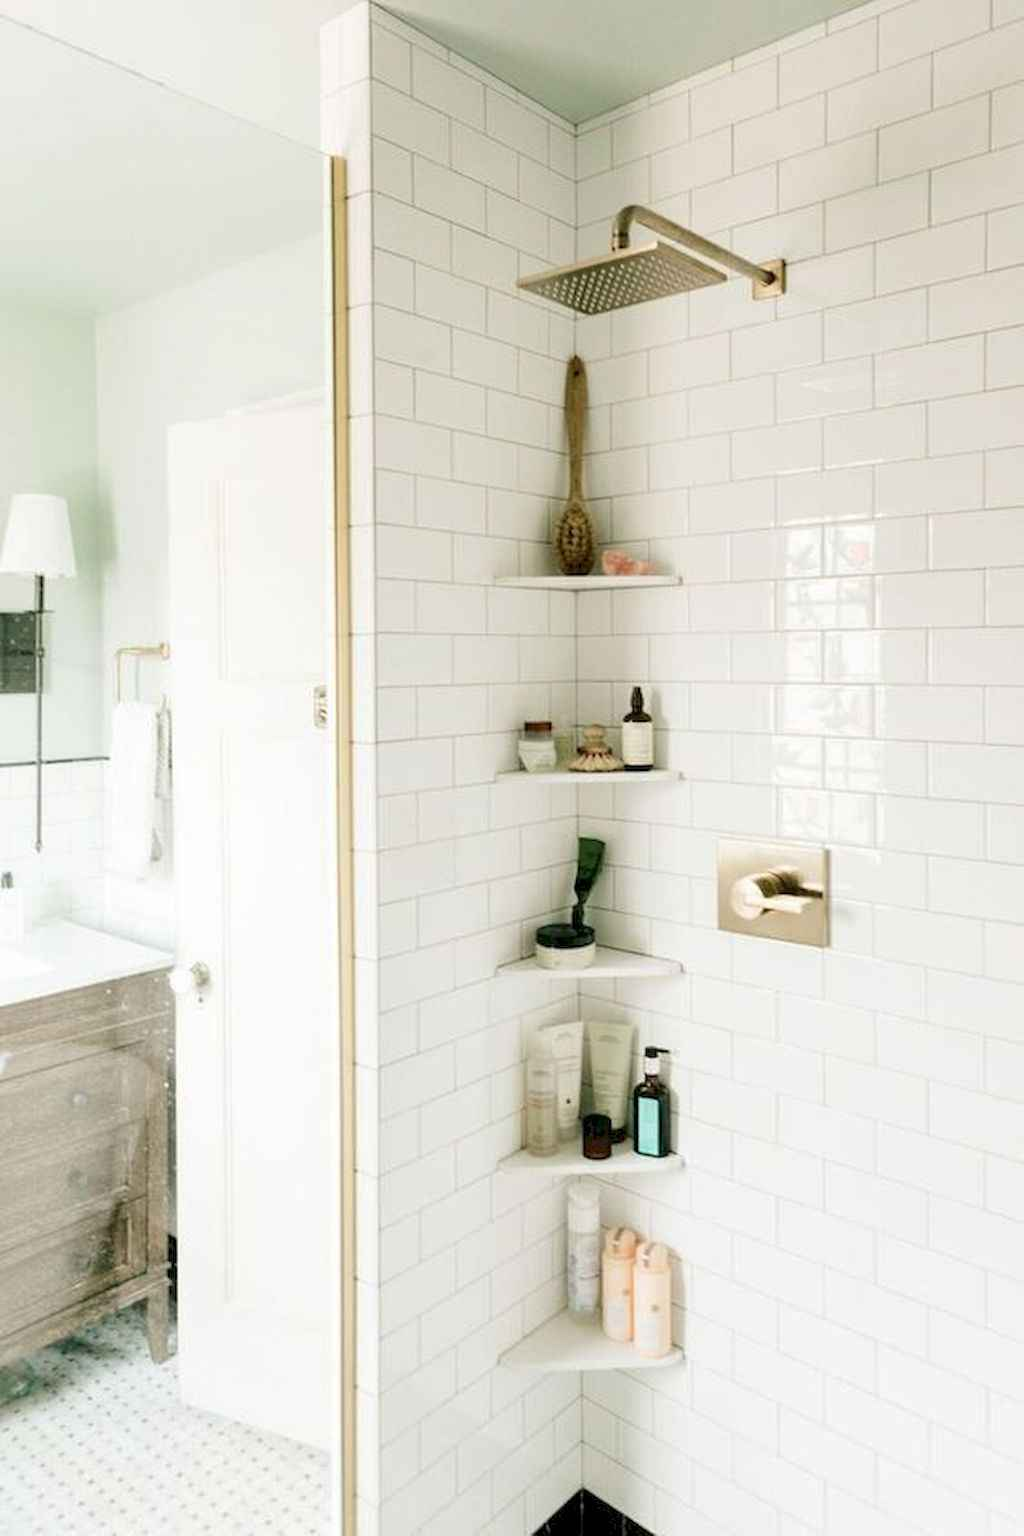 111 Brilliant Small Bathroom Remodel Ideas On A Budget (17)